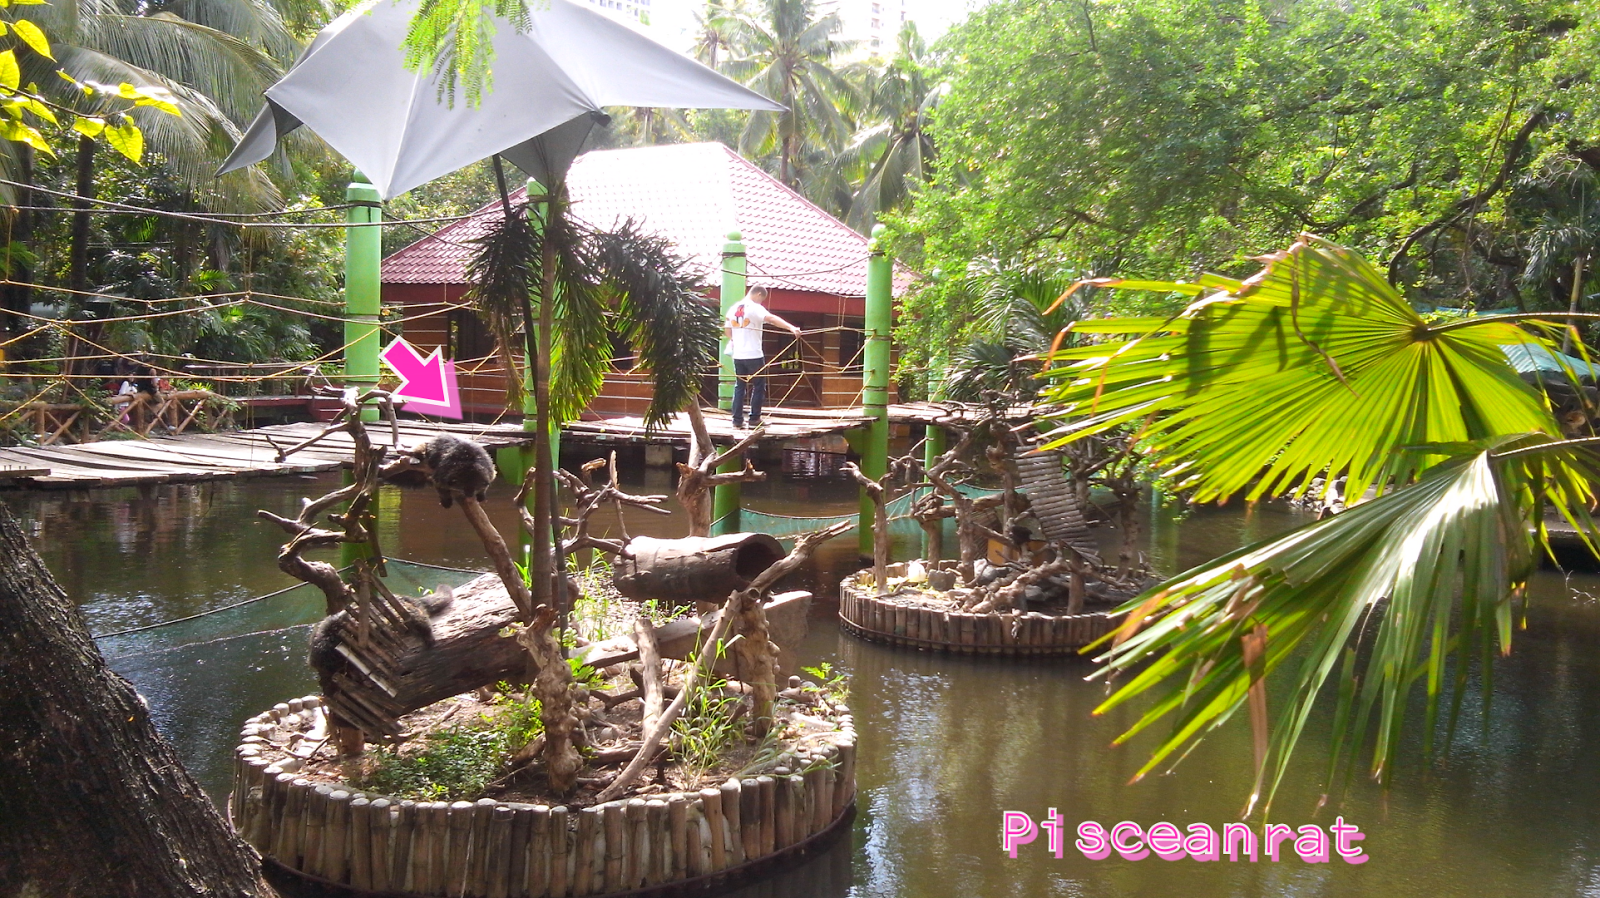 kinder zoo philippines